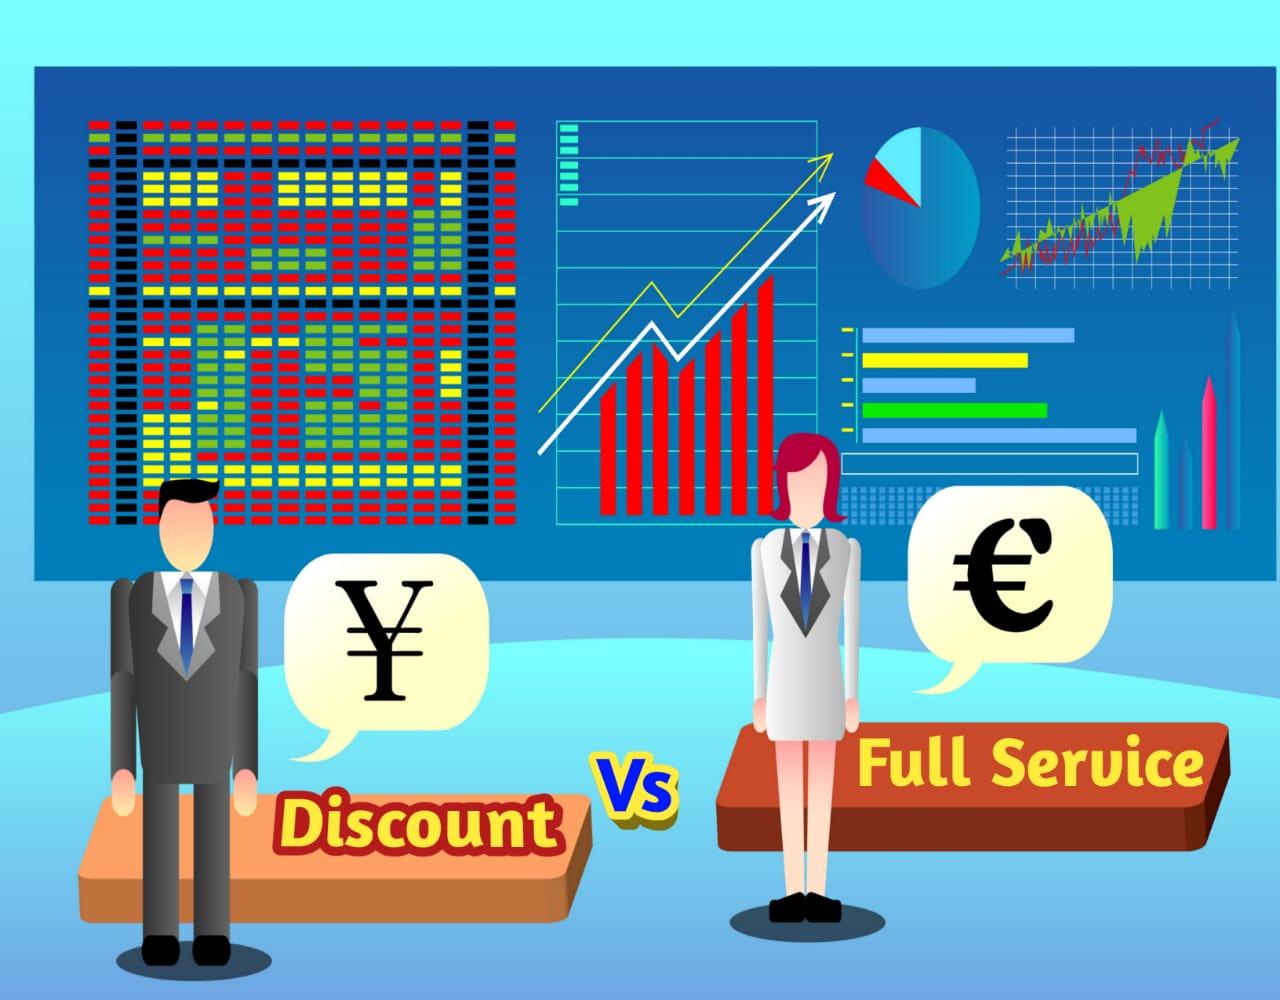 Compare Full service stock broker vs discount stoack broker